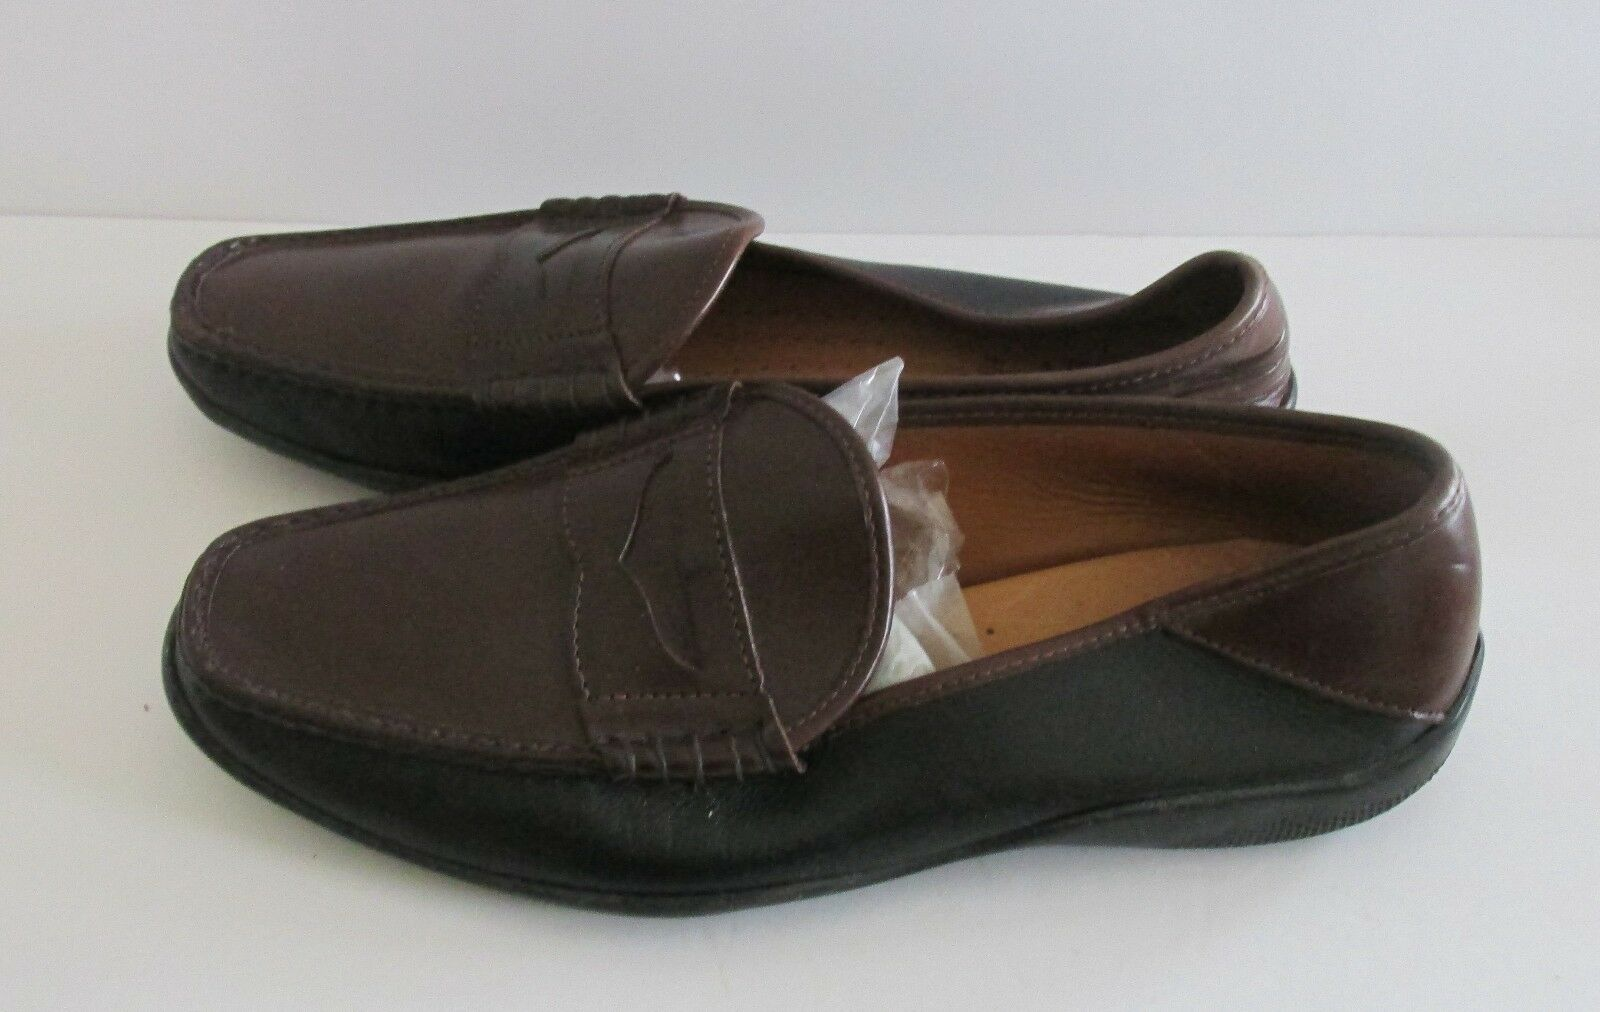 Men's Sz 11 D Allen Edmonds HYDE Calf Leather Made in USA 2 Tone Run Short Penny